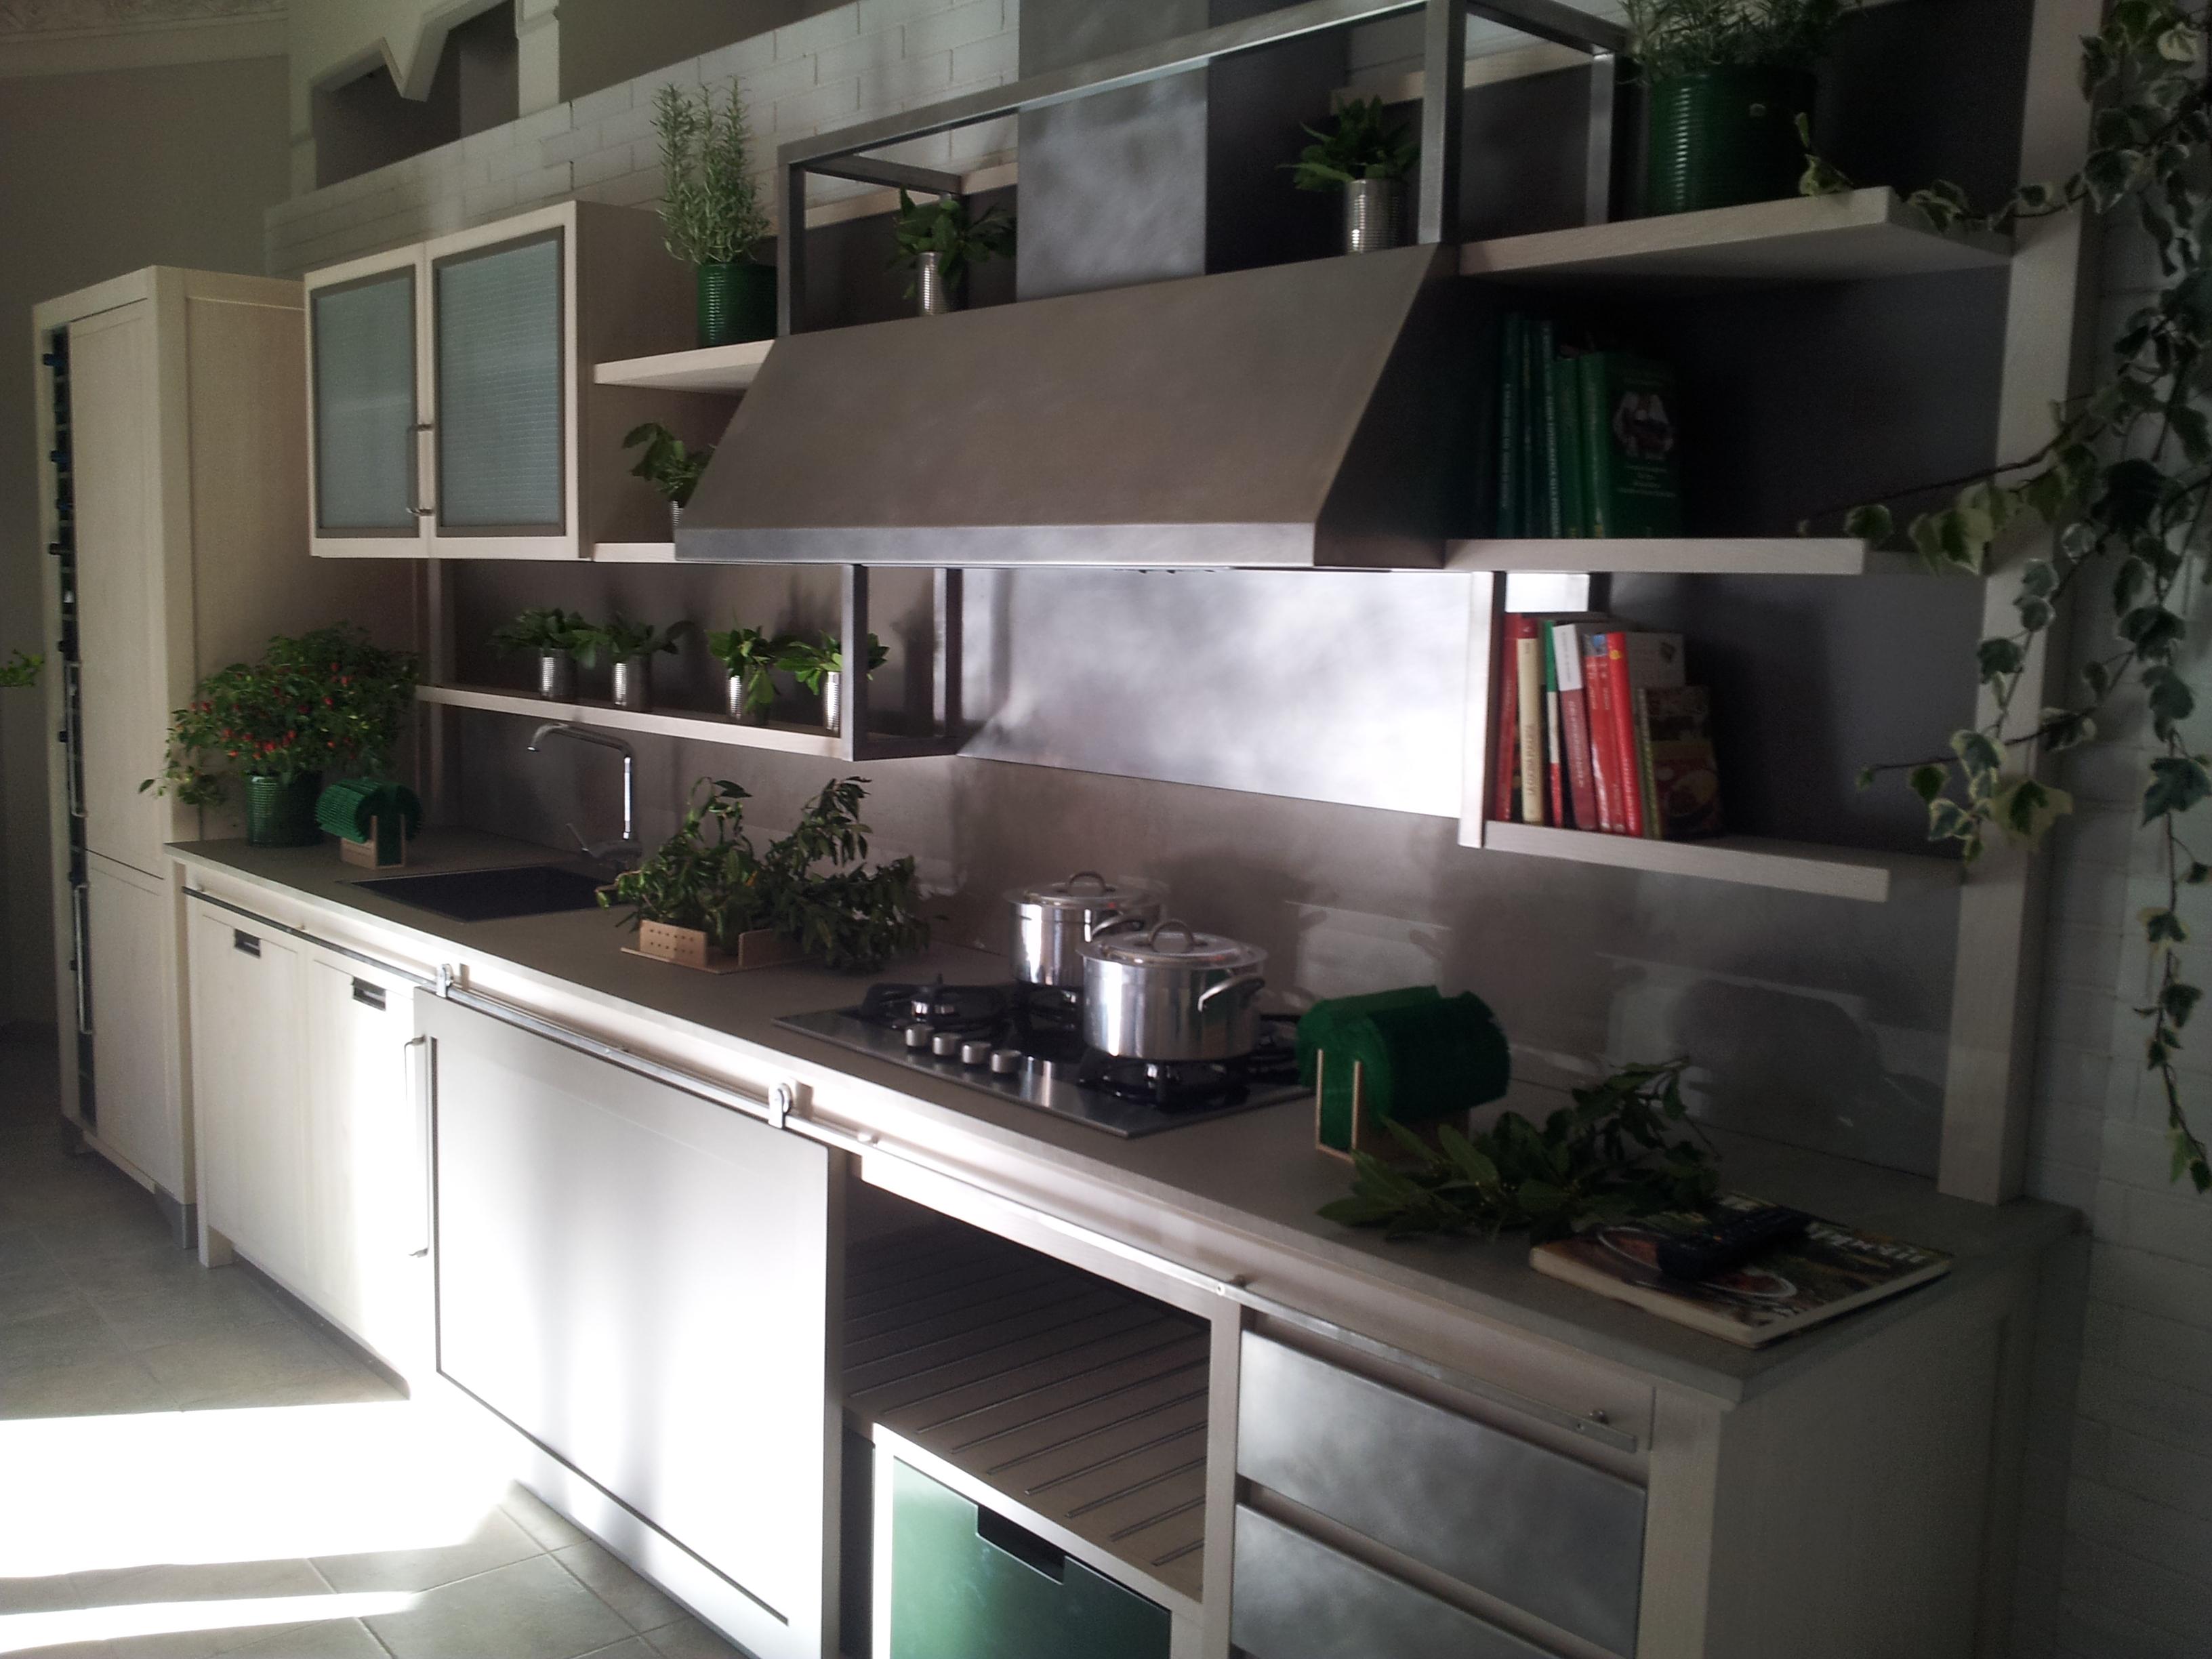 Centro cucine moderne arrex miton cucine moderne stosa - Miton cucine prezzi ...